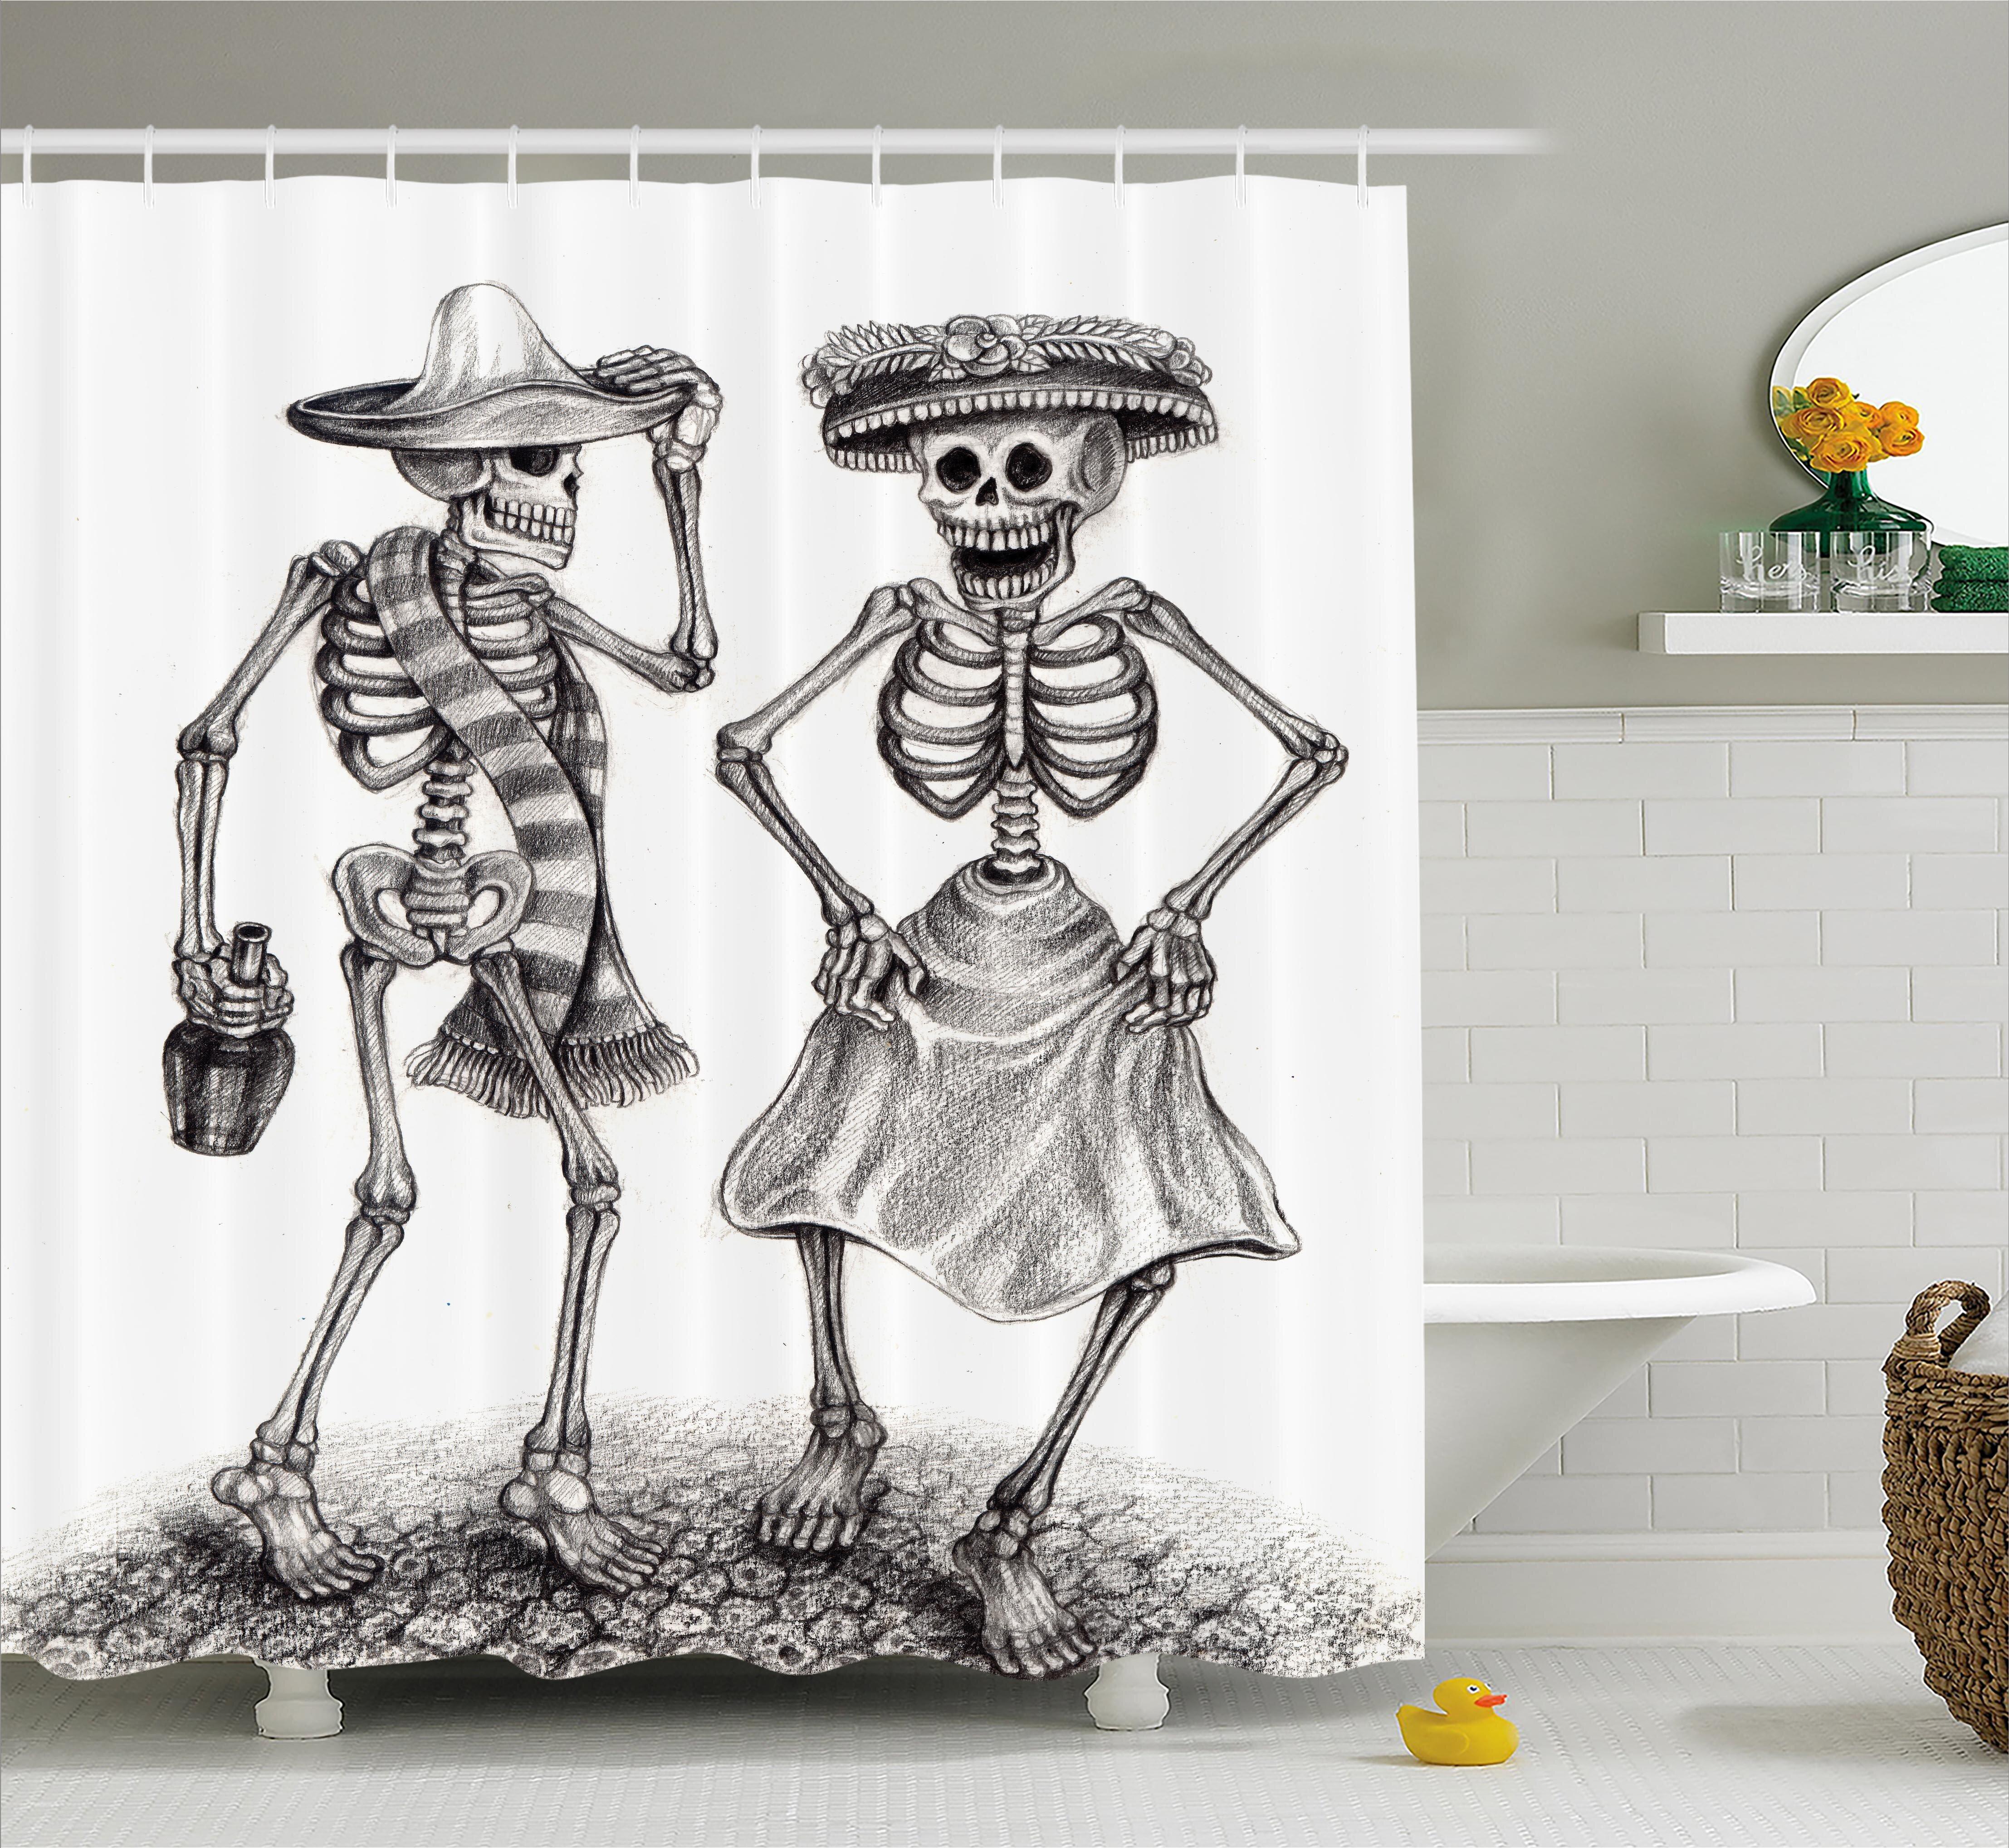 Ebern Designs Kristie Day Of The Dead Festive Celebration Mexican Dancing Couple Skeleton Art Print Shower Curtain